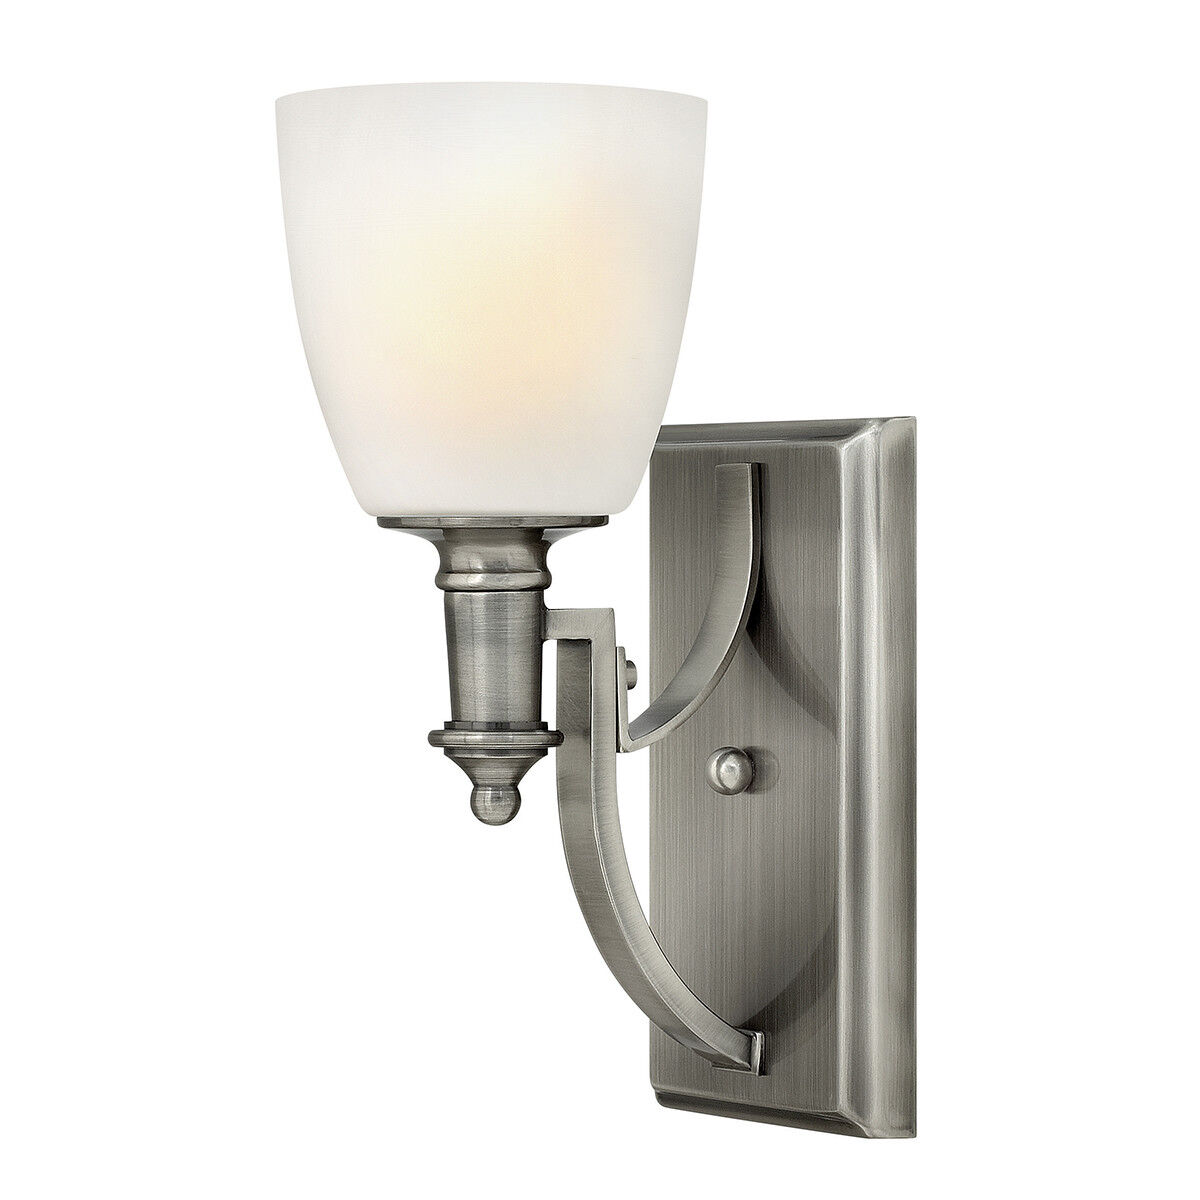 hinkely éclairage TruFemme 1 Litre Lampe Lampe Lampe Murale 1 x 60W E27 220-240V 50Hz CLASSE I   De Gagner Une Grande Admiration  a27b09